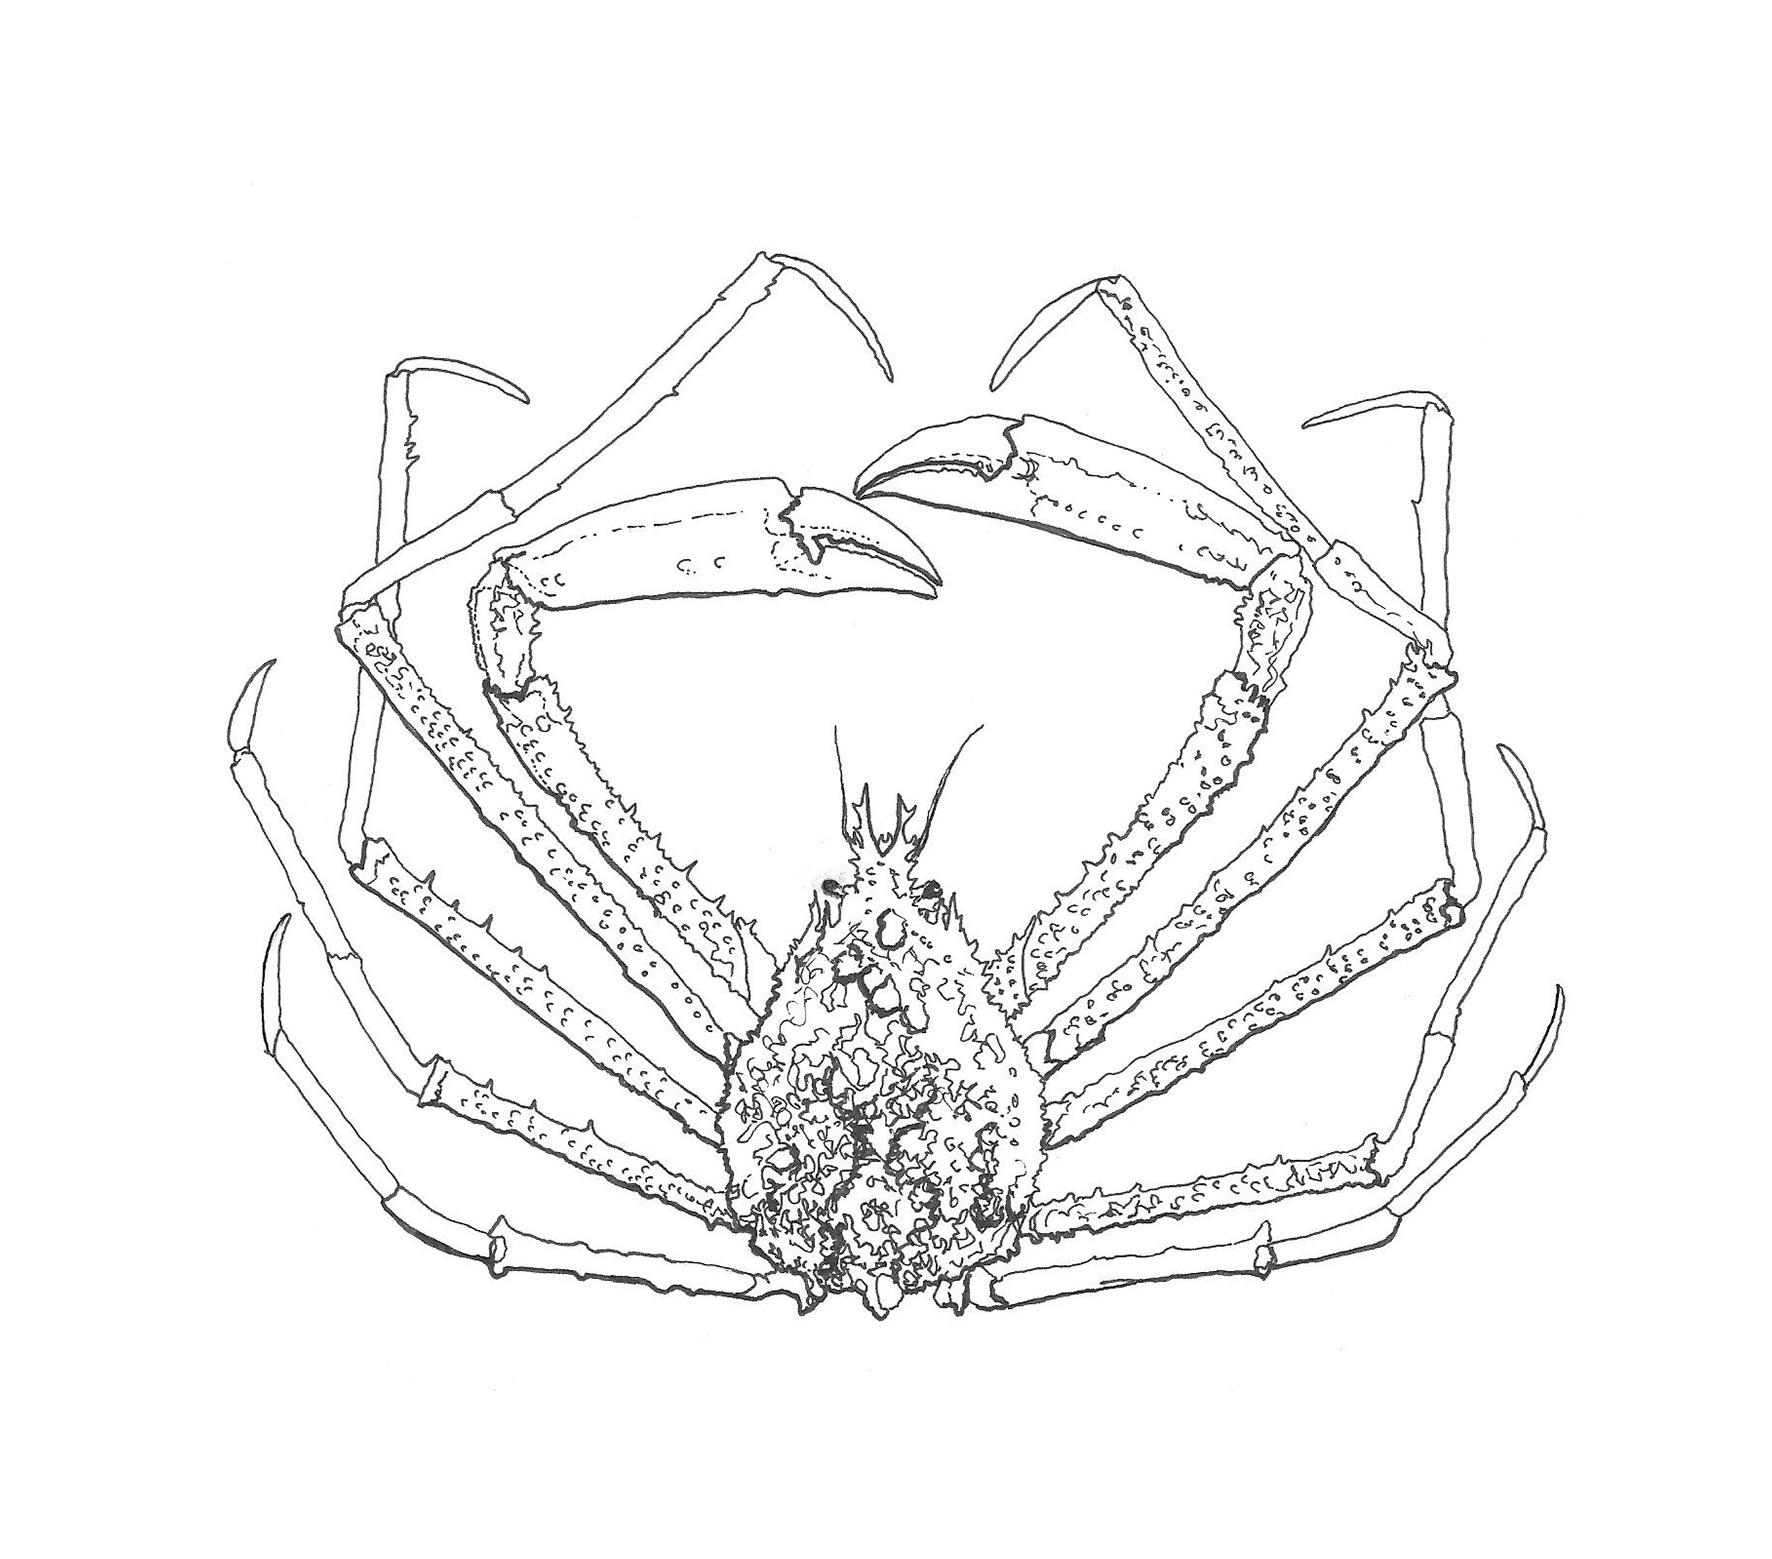 Whiten_crab_illustration_6whiteback2.jpg